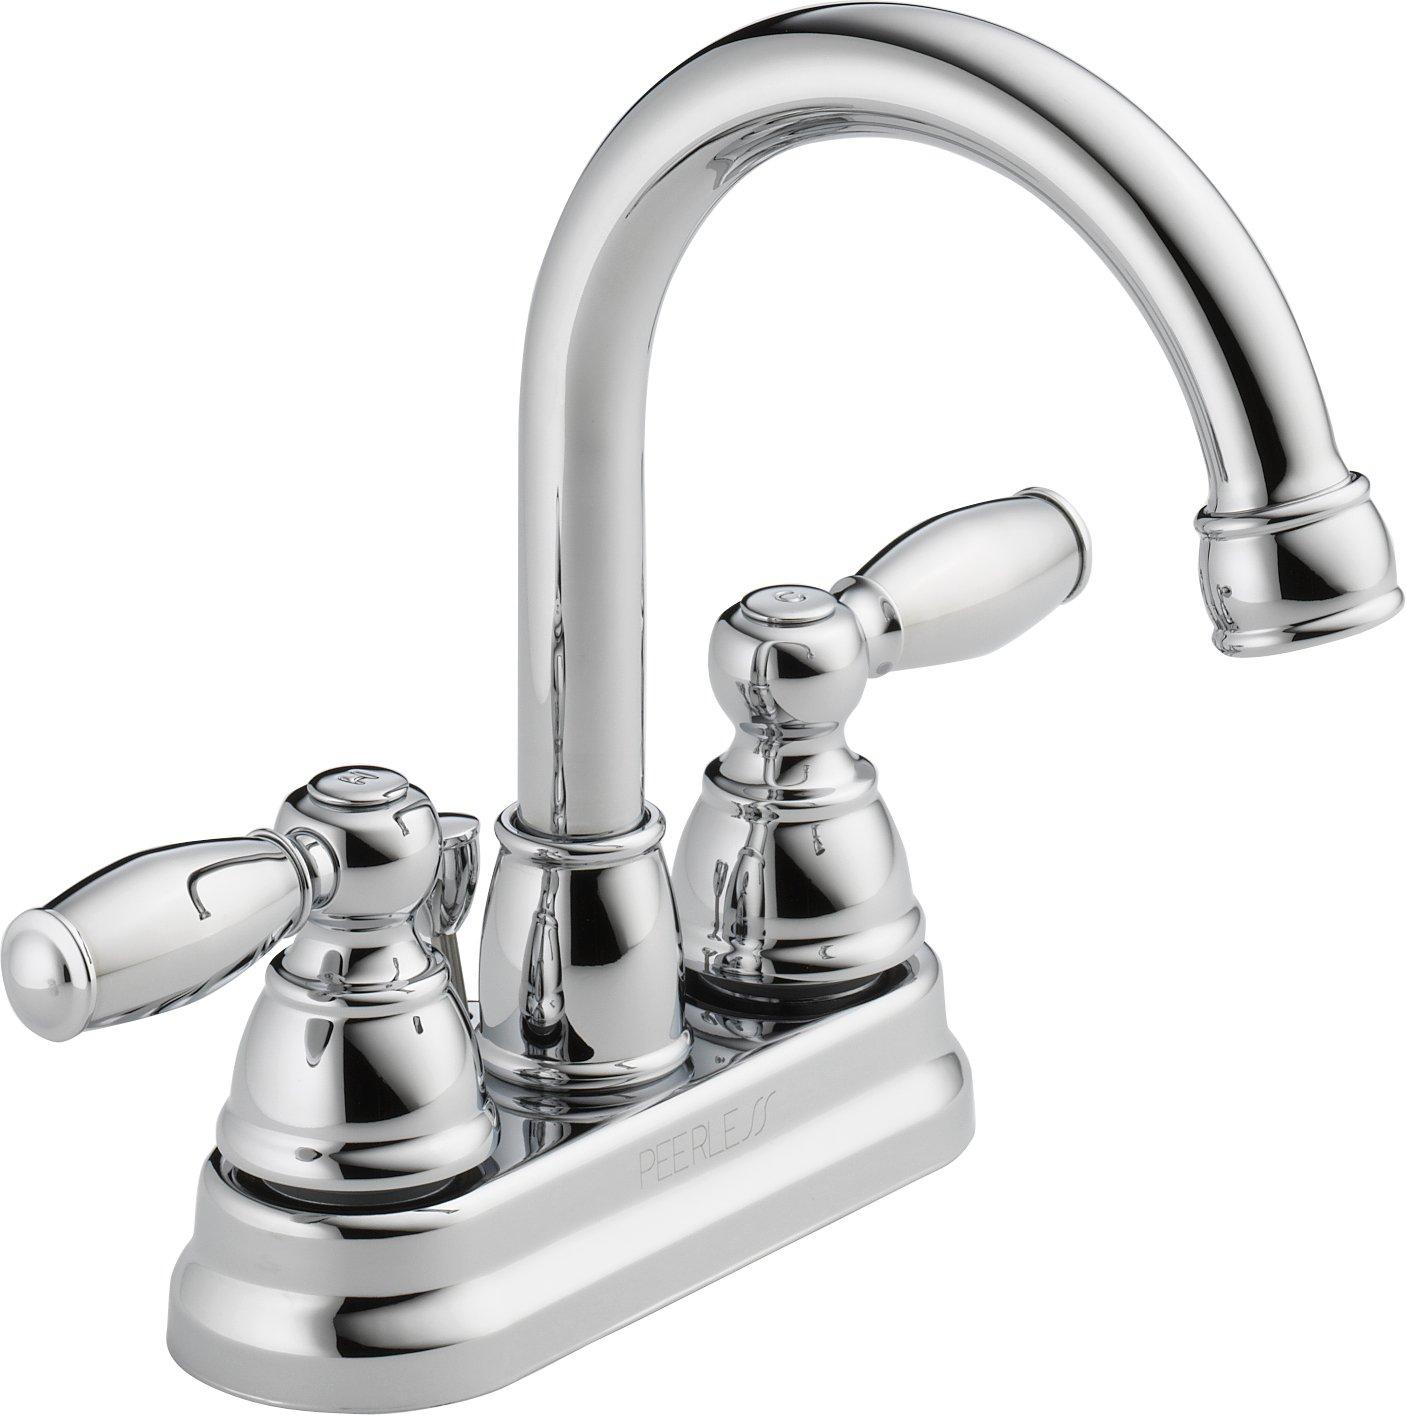 Peerless P299685LF Apex Lavatory Faucet